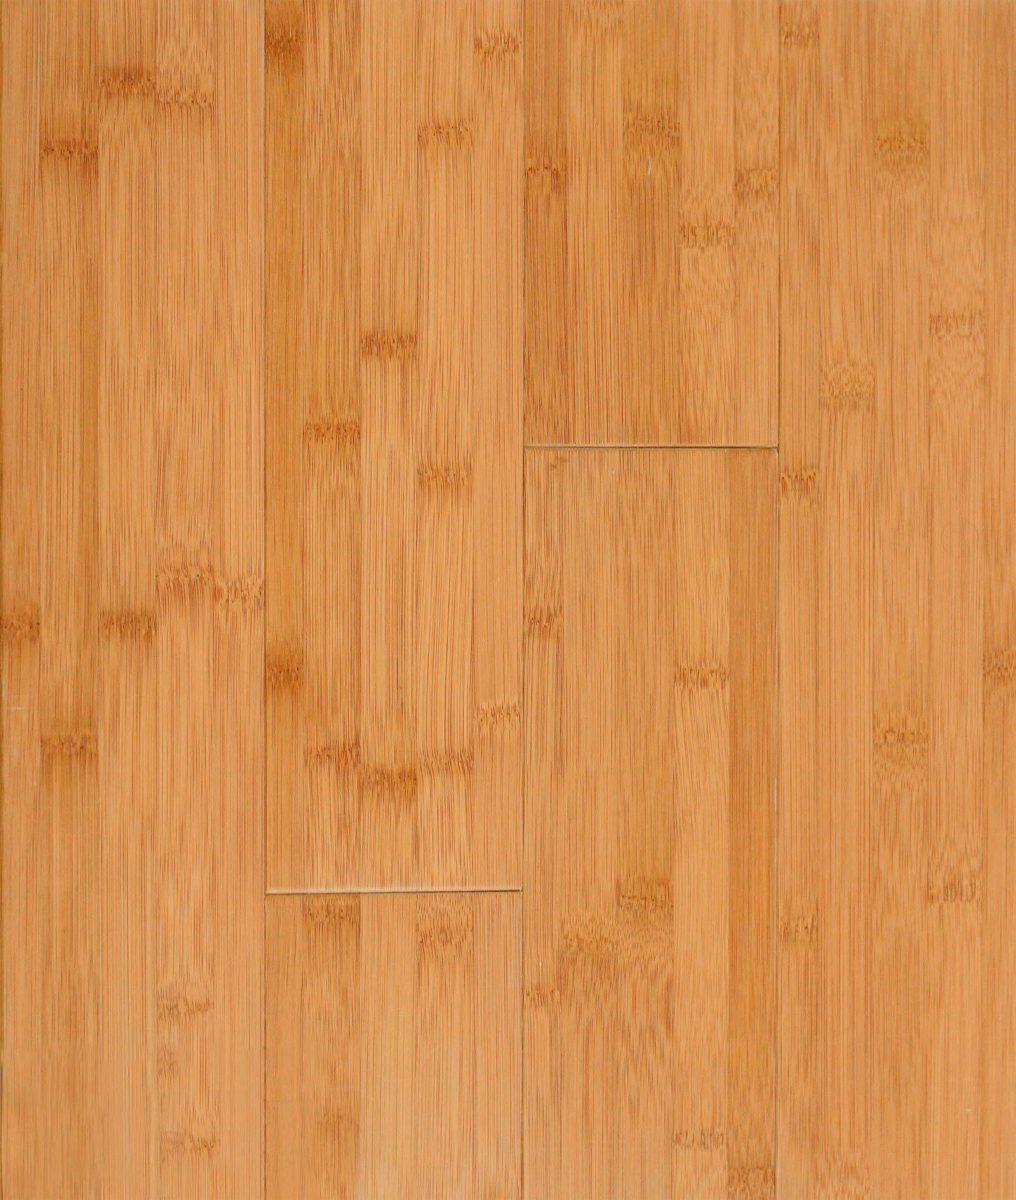 Pisos De Madera Bamboo Bambu Piso Himwood 999 00 En